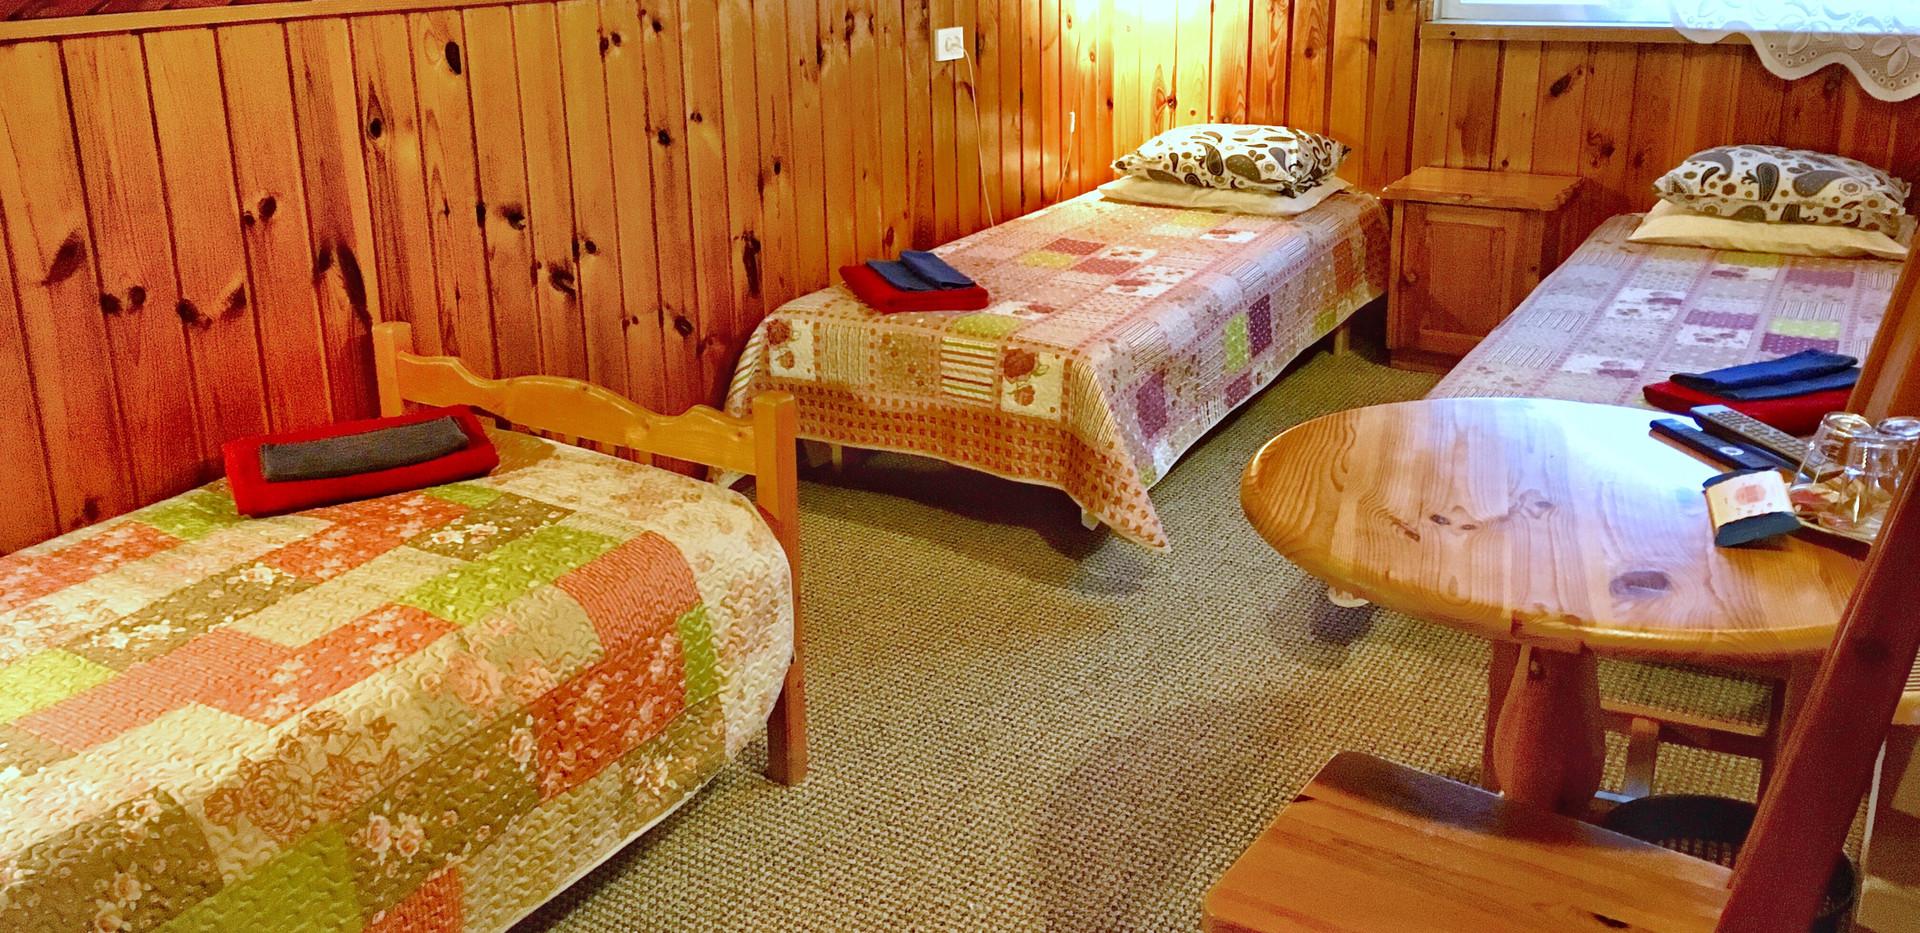 Tuba nr 7 - Külalistemaja Kikas